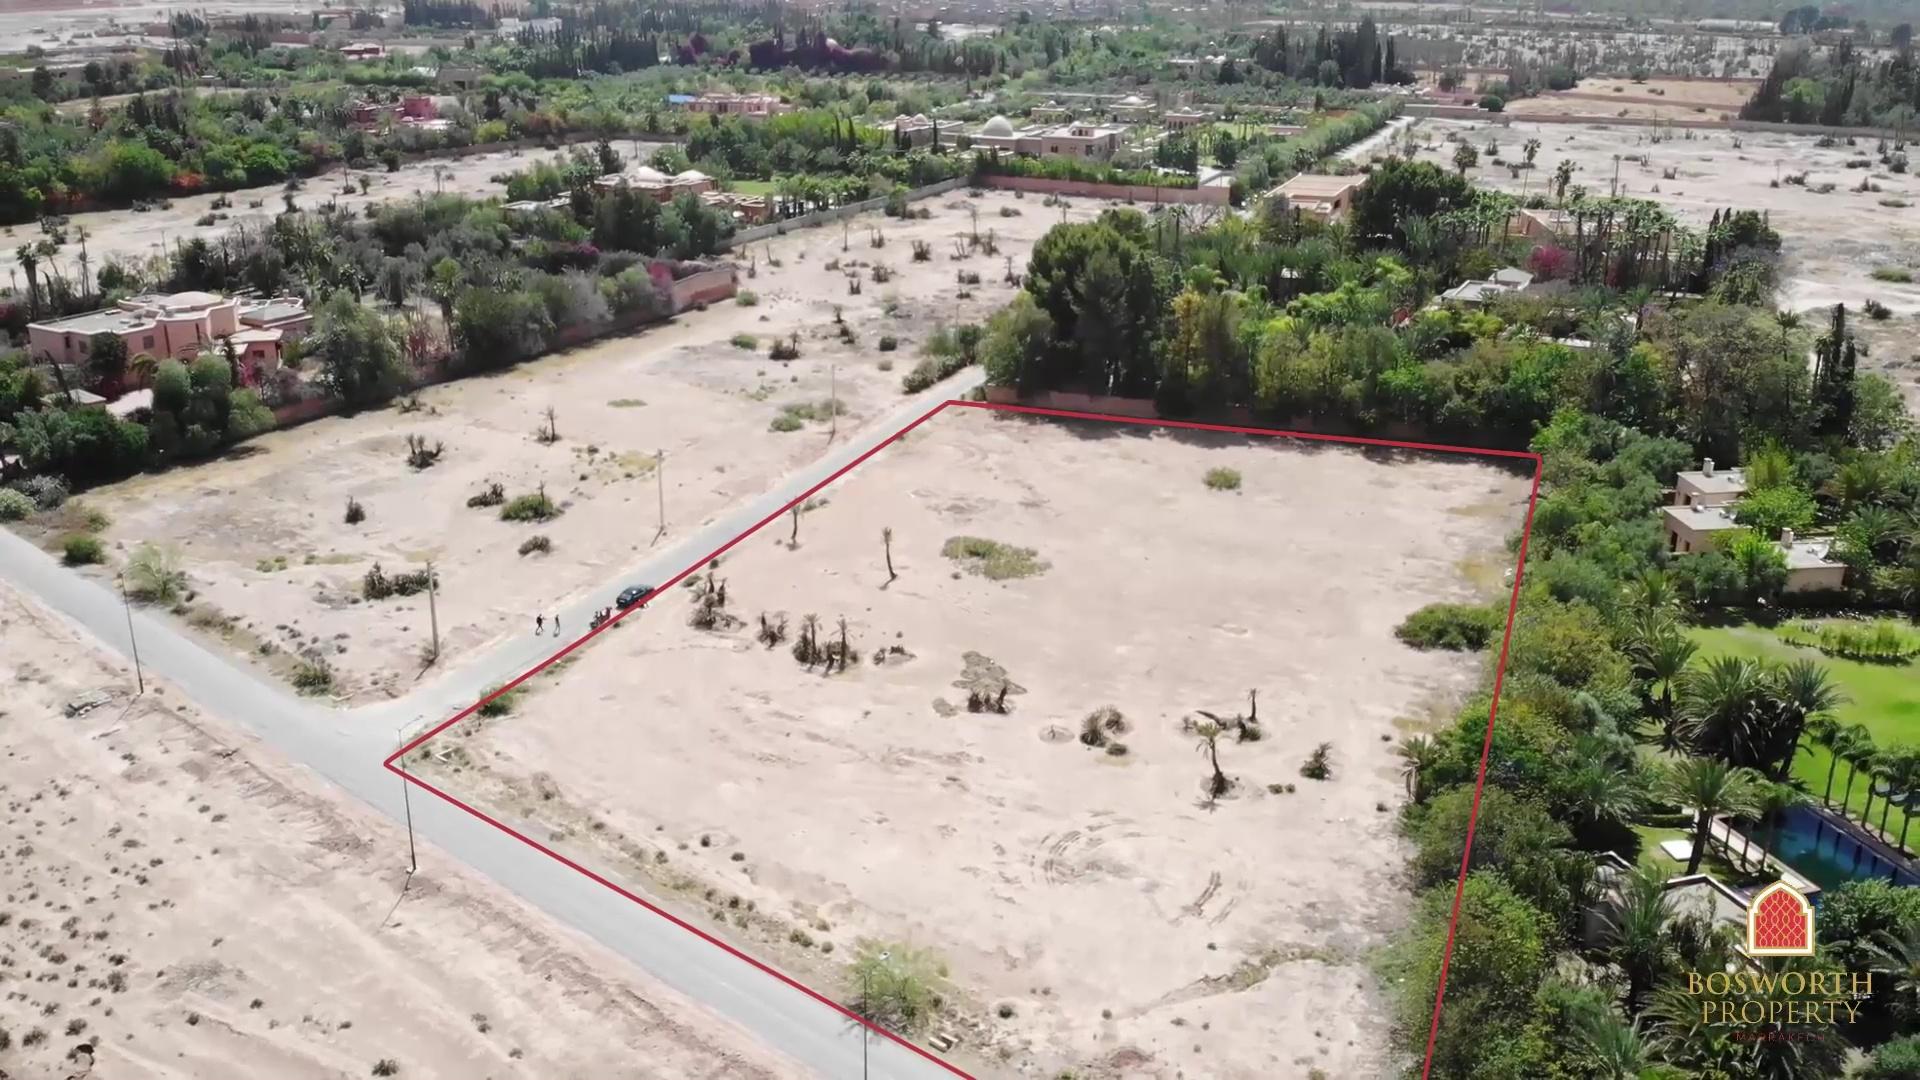 Land For Sale Marrakech Palmeraie 1ha - Marrakech Real Estate - Marrakesh Realty - Terrain a Vendre Marrakech Palmeraie - immobilier marrakech